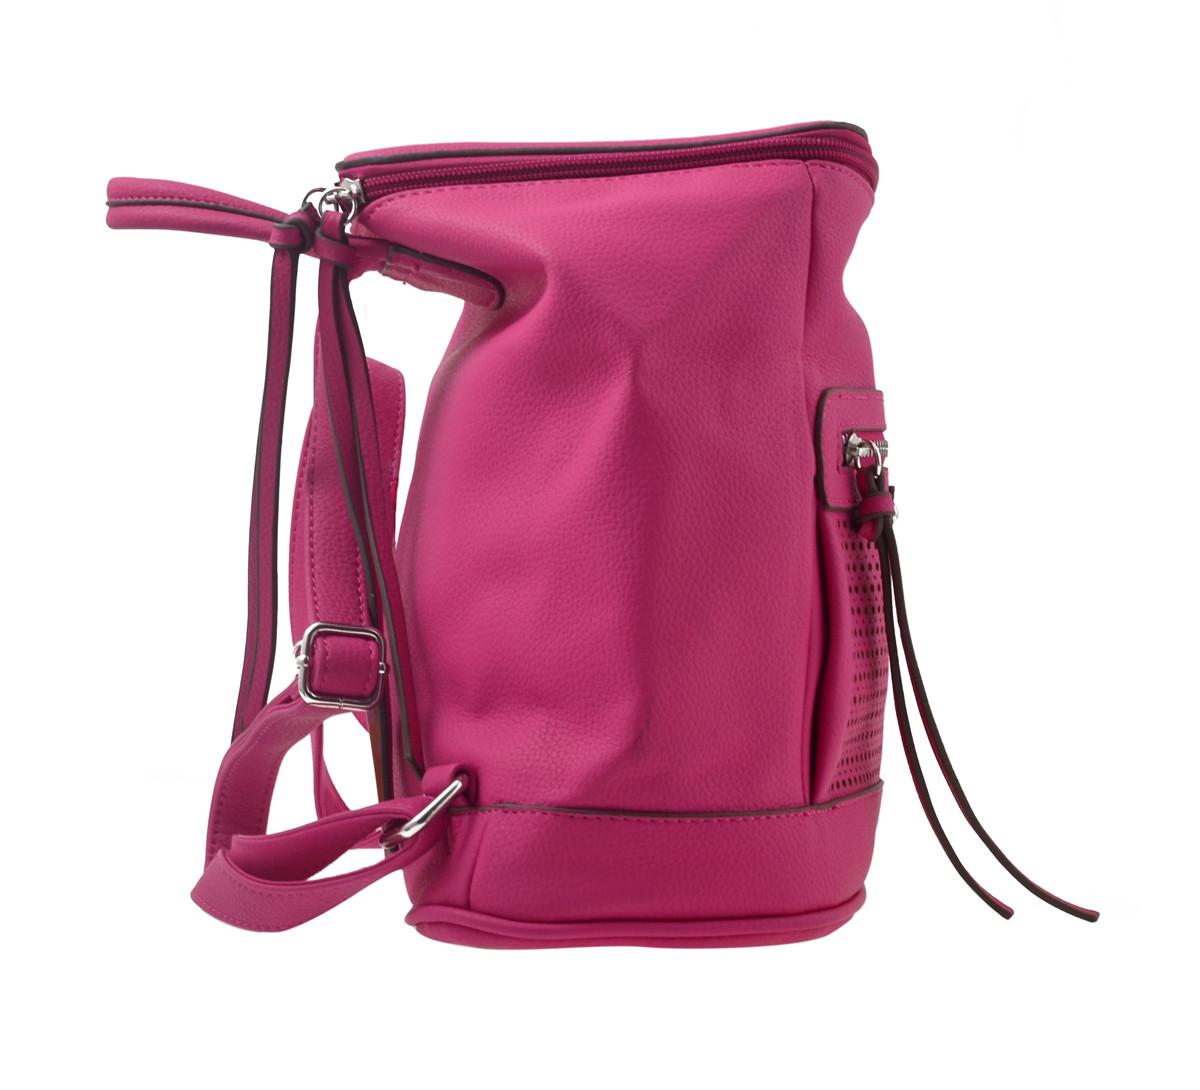 Сумка-рюкзак  YES, розовый , 26*14*27см